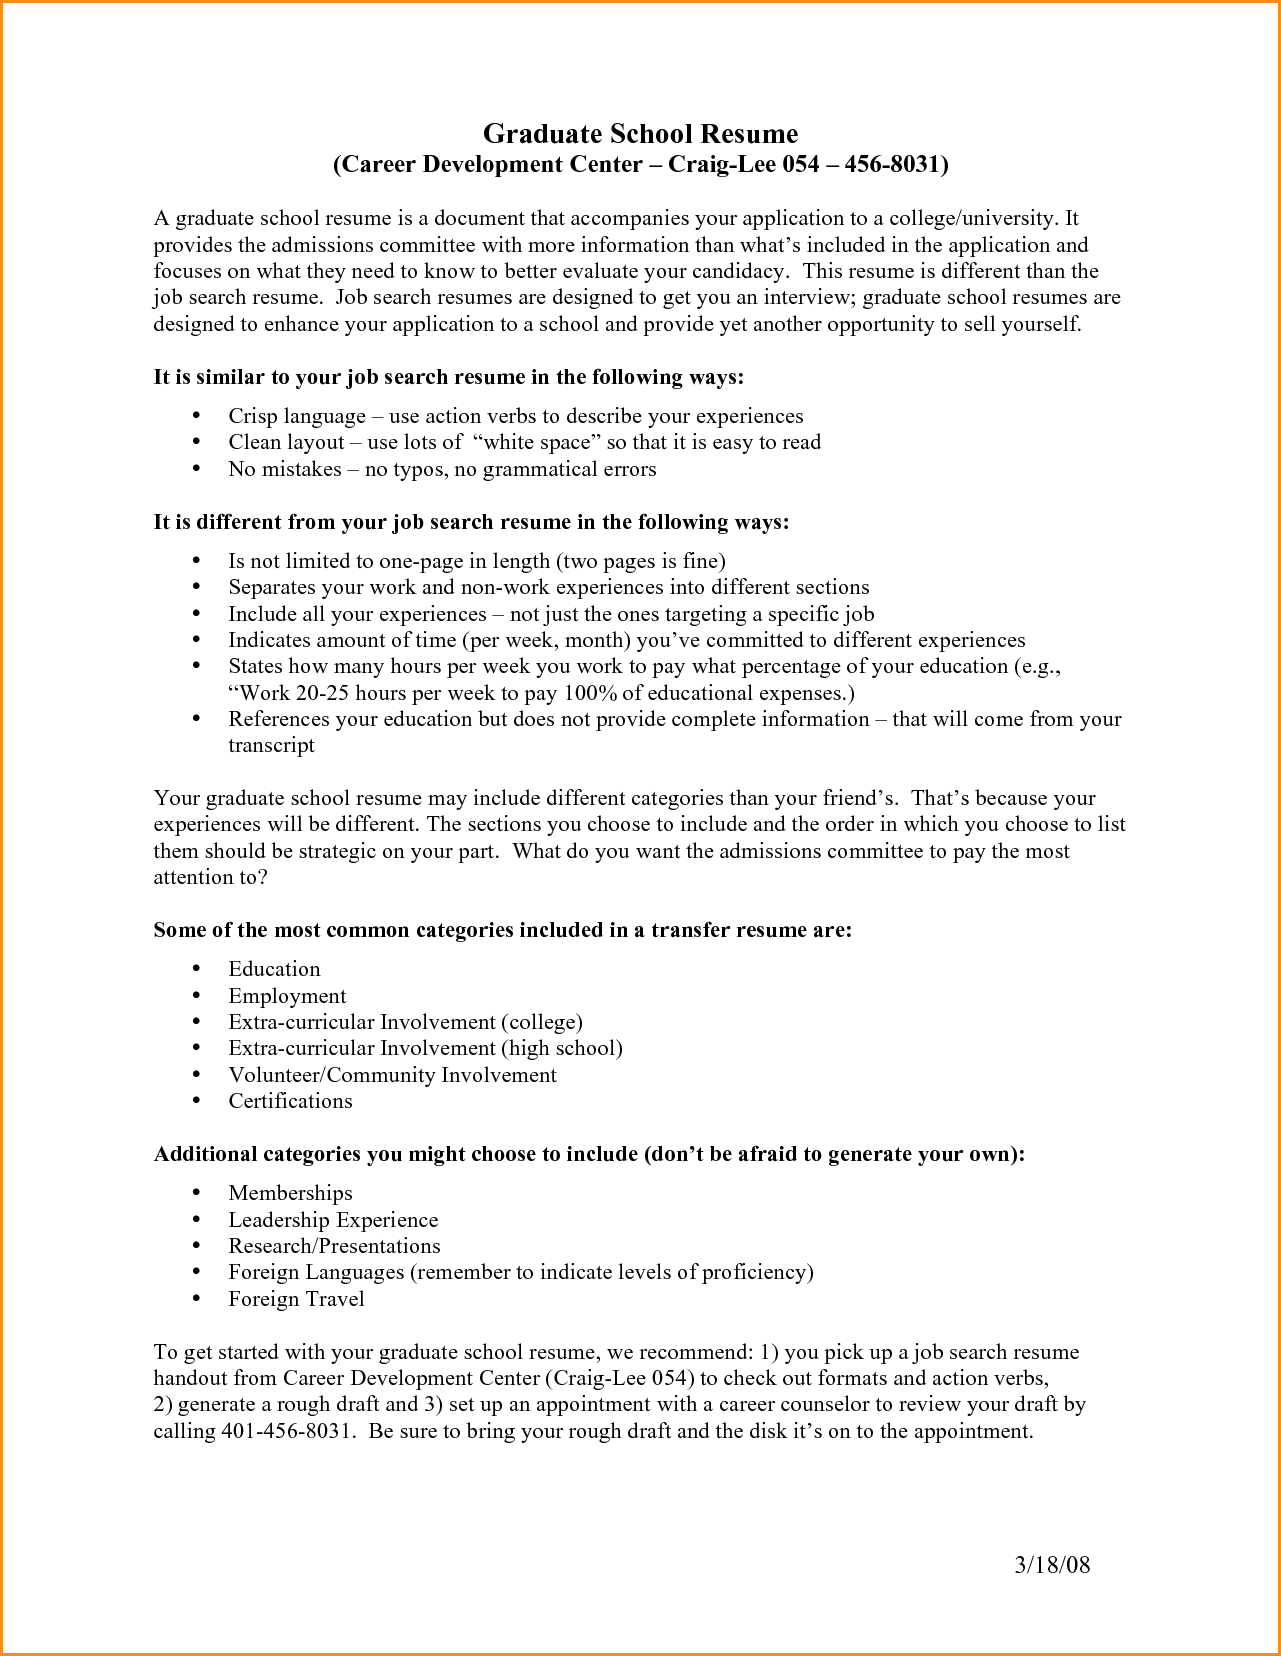 Resume Examples Grad School